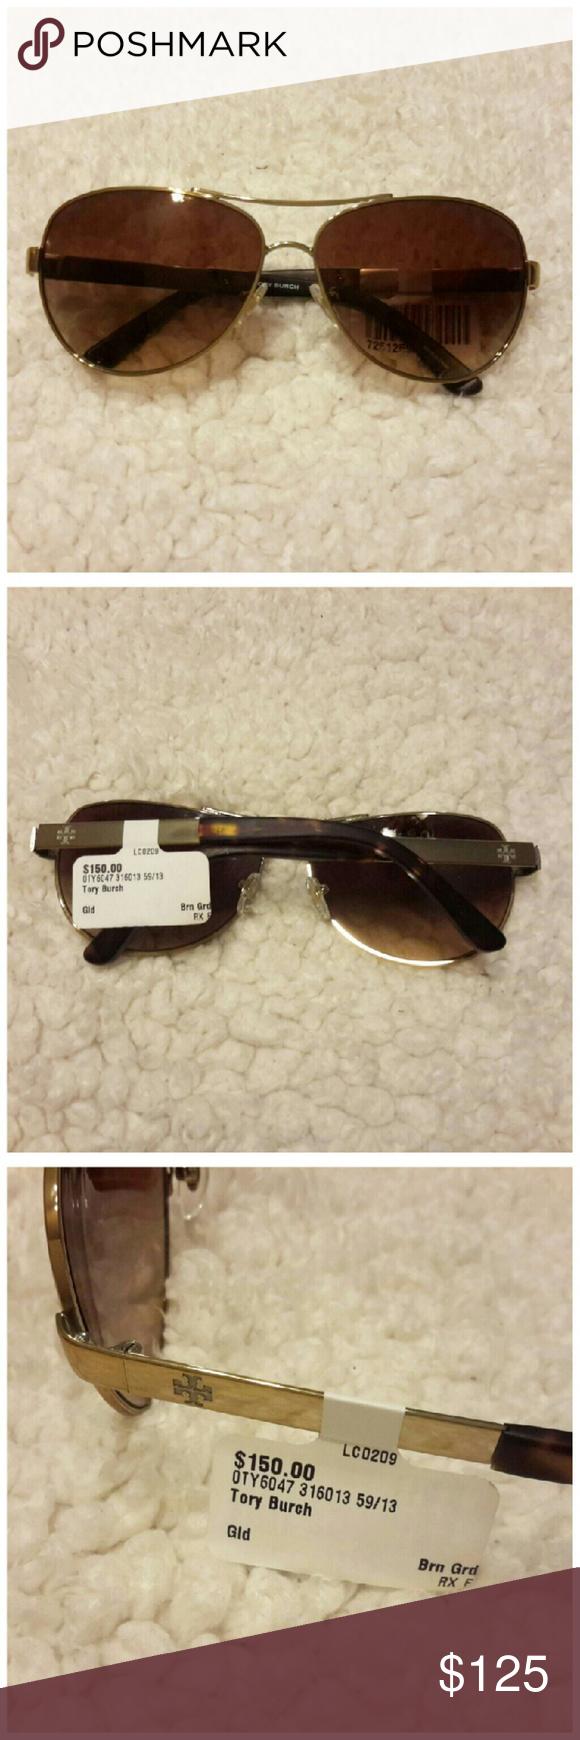 c940d966ddc8b Tory Burch TY6047 Aviator Sunglasses Brand new with tags Tory Burch Aviator  Sunglasses. Style TY6047